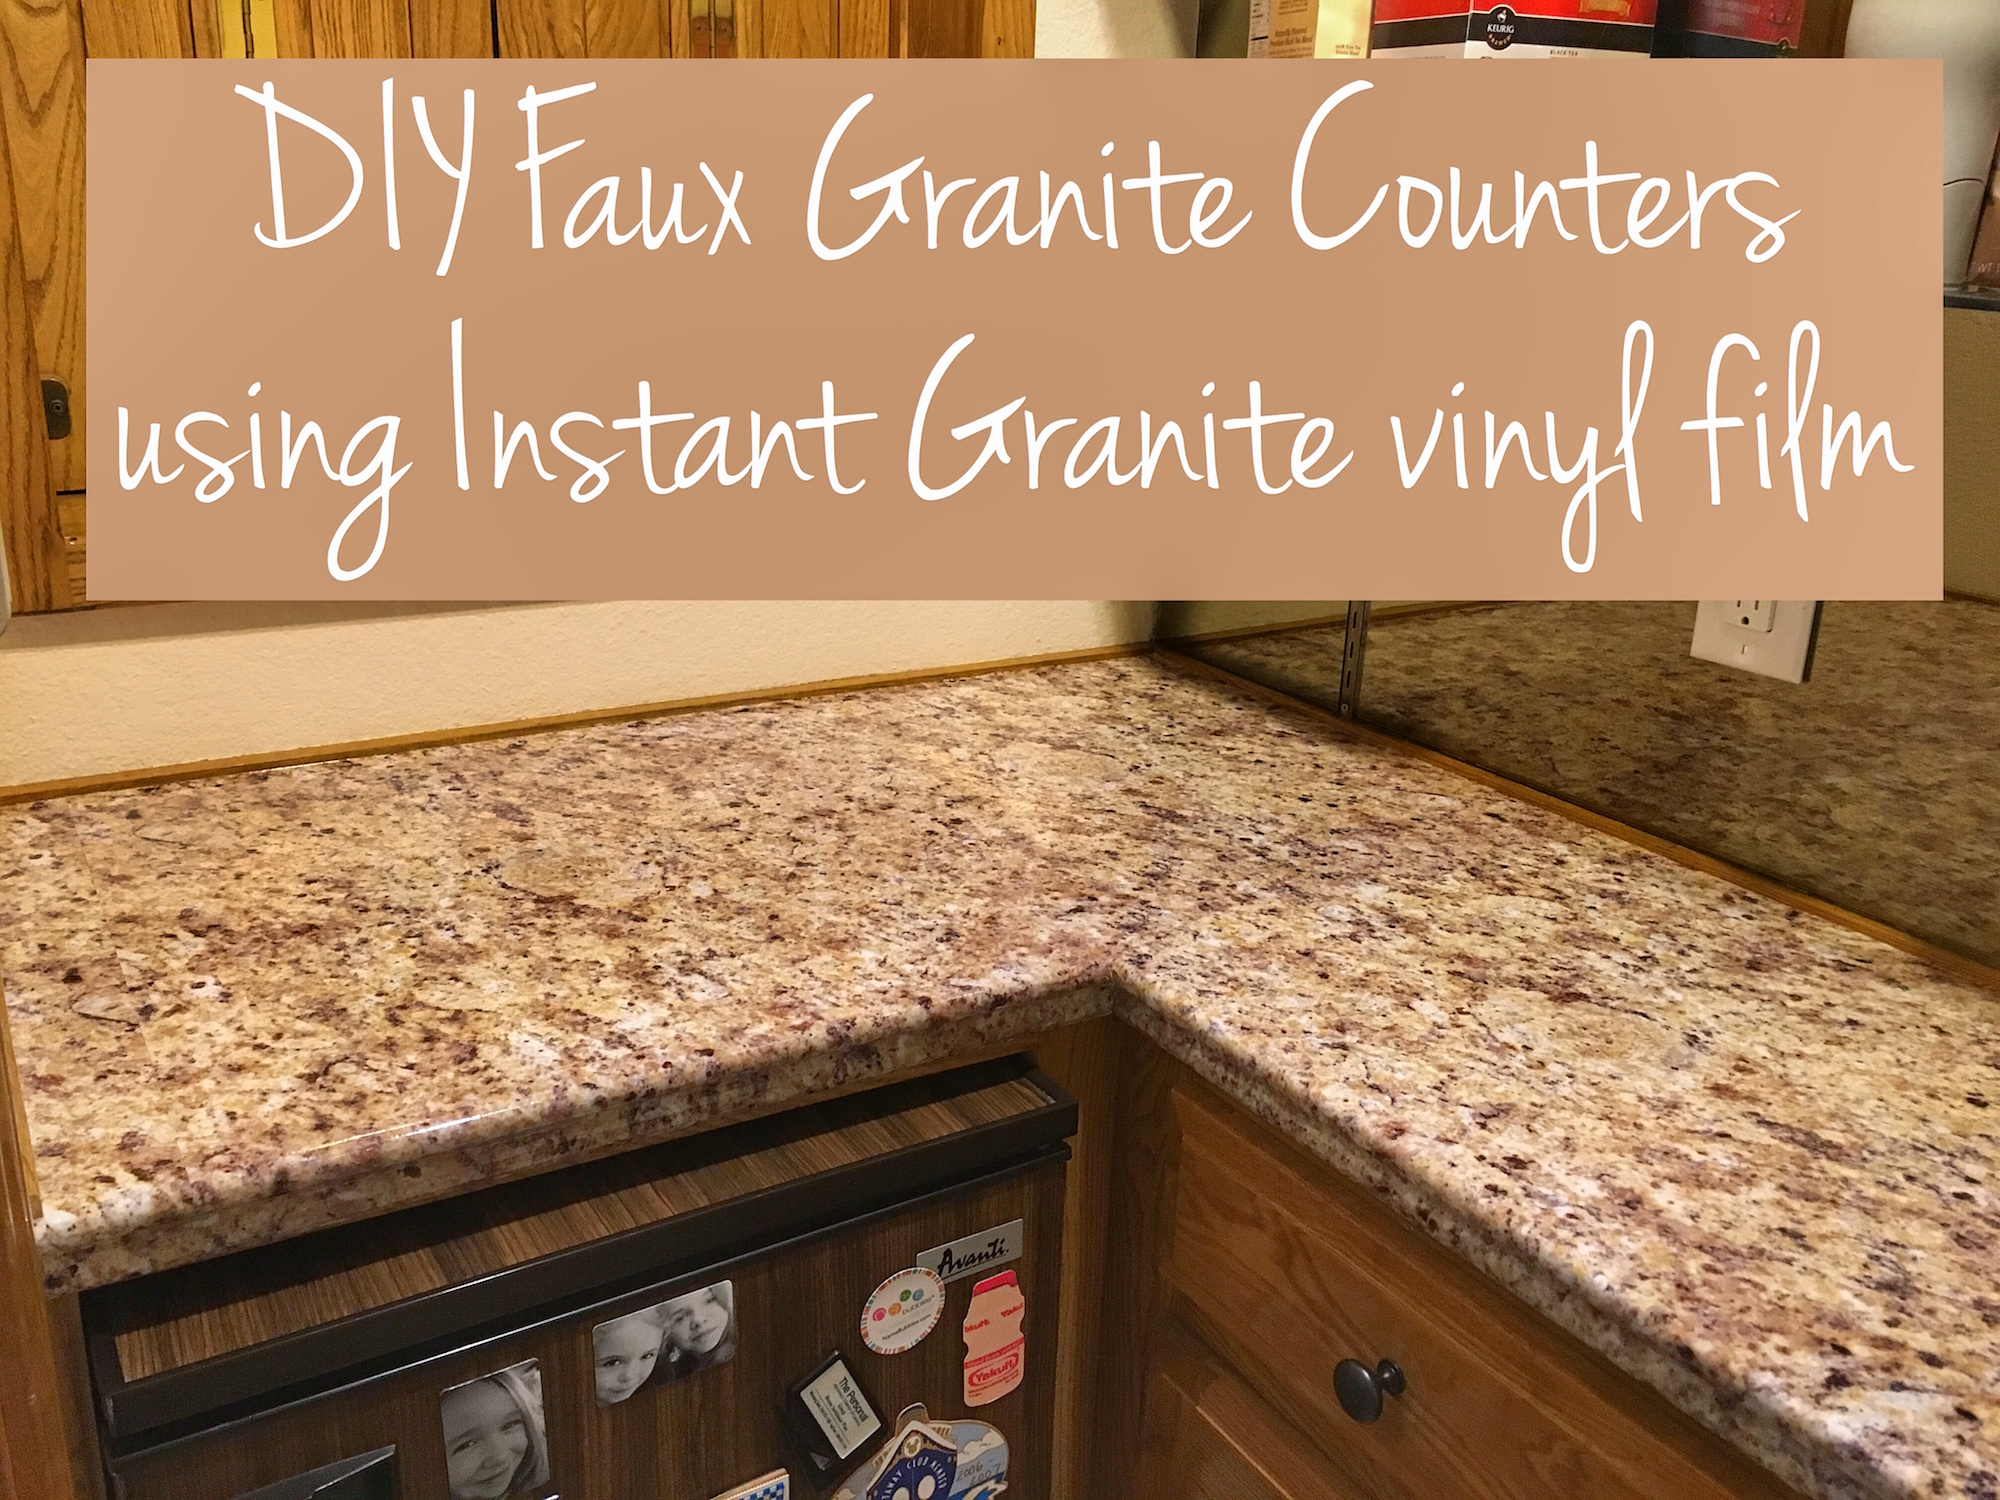 Instant Granite Samples : Transform your countertops with a diy fake granite counter